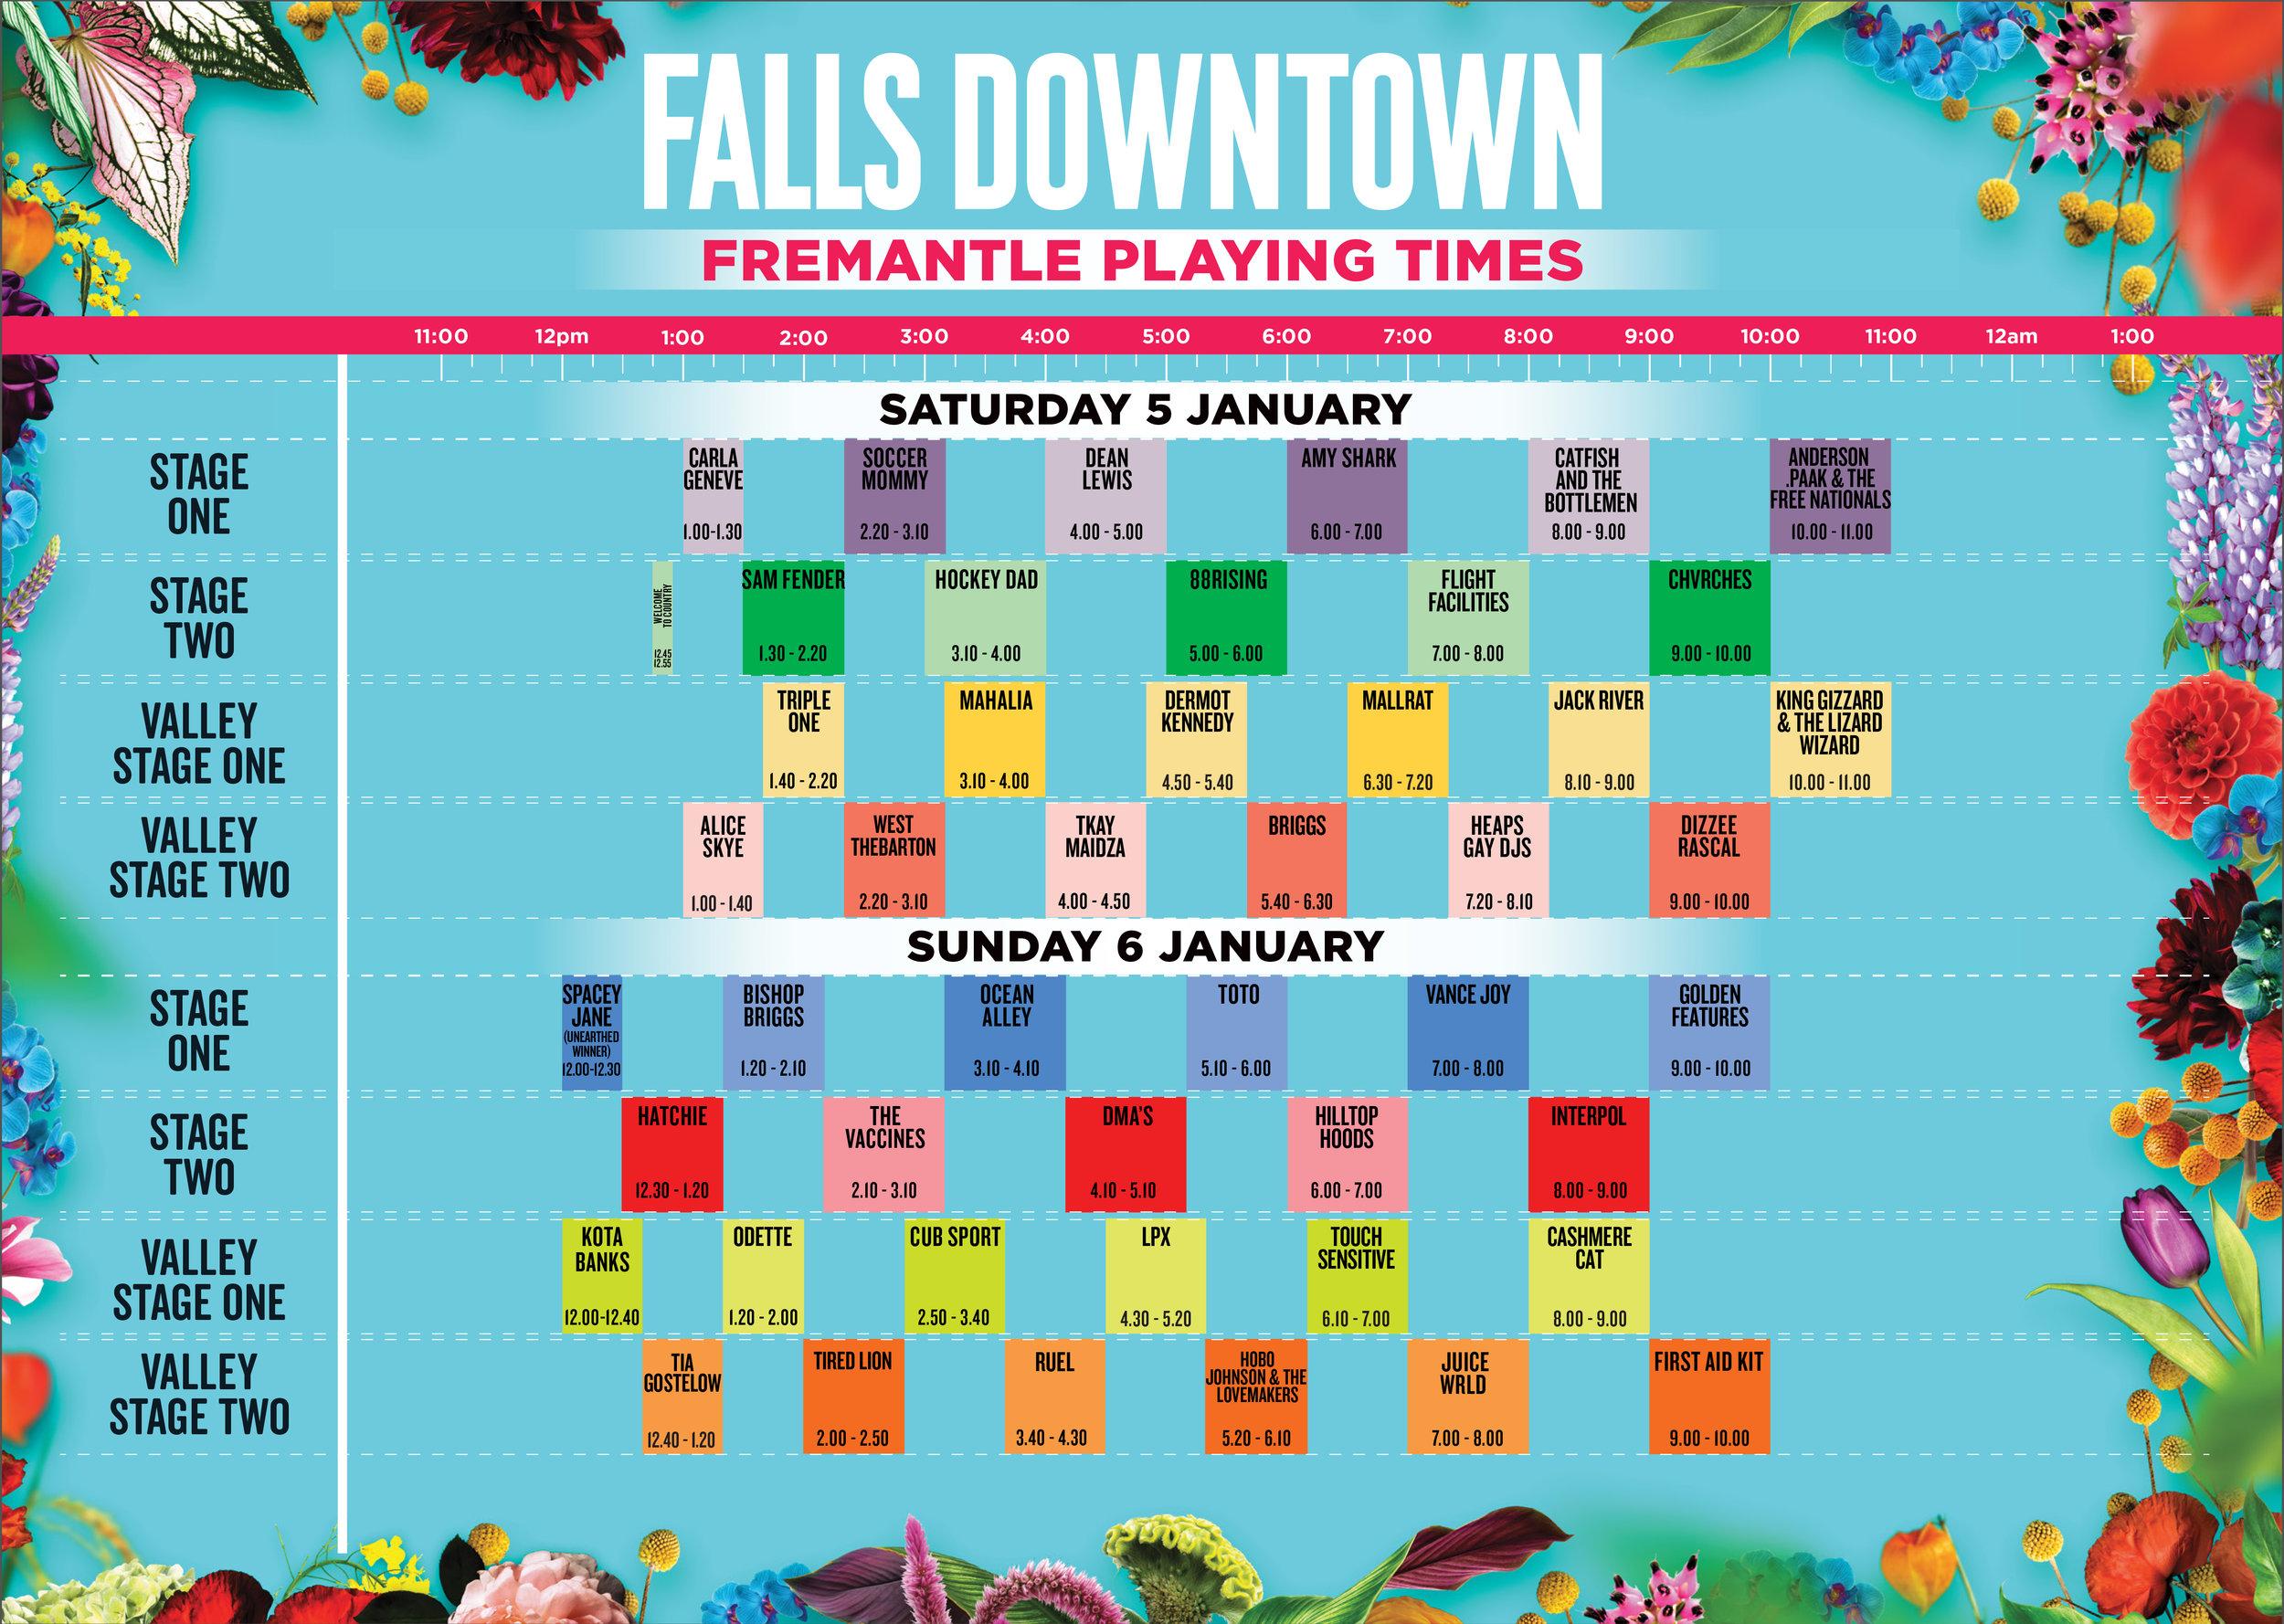 FALLS_2018_PlayingTimes_Downtown_1812_01.jpg